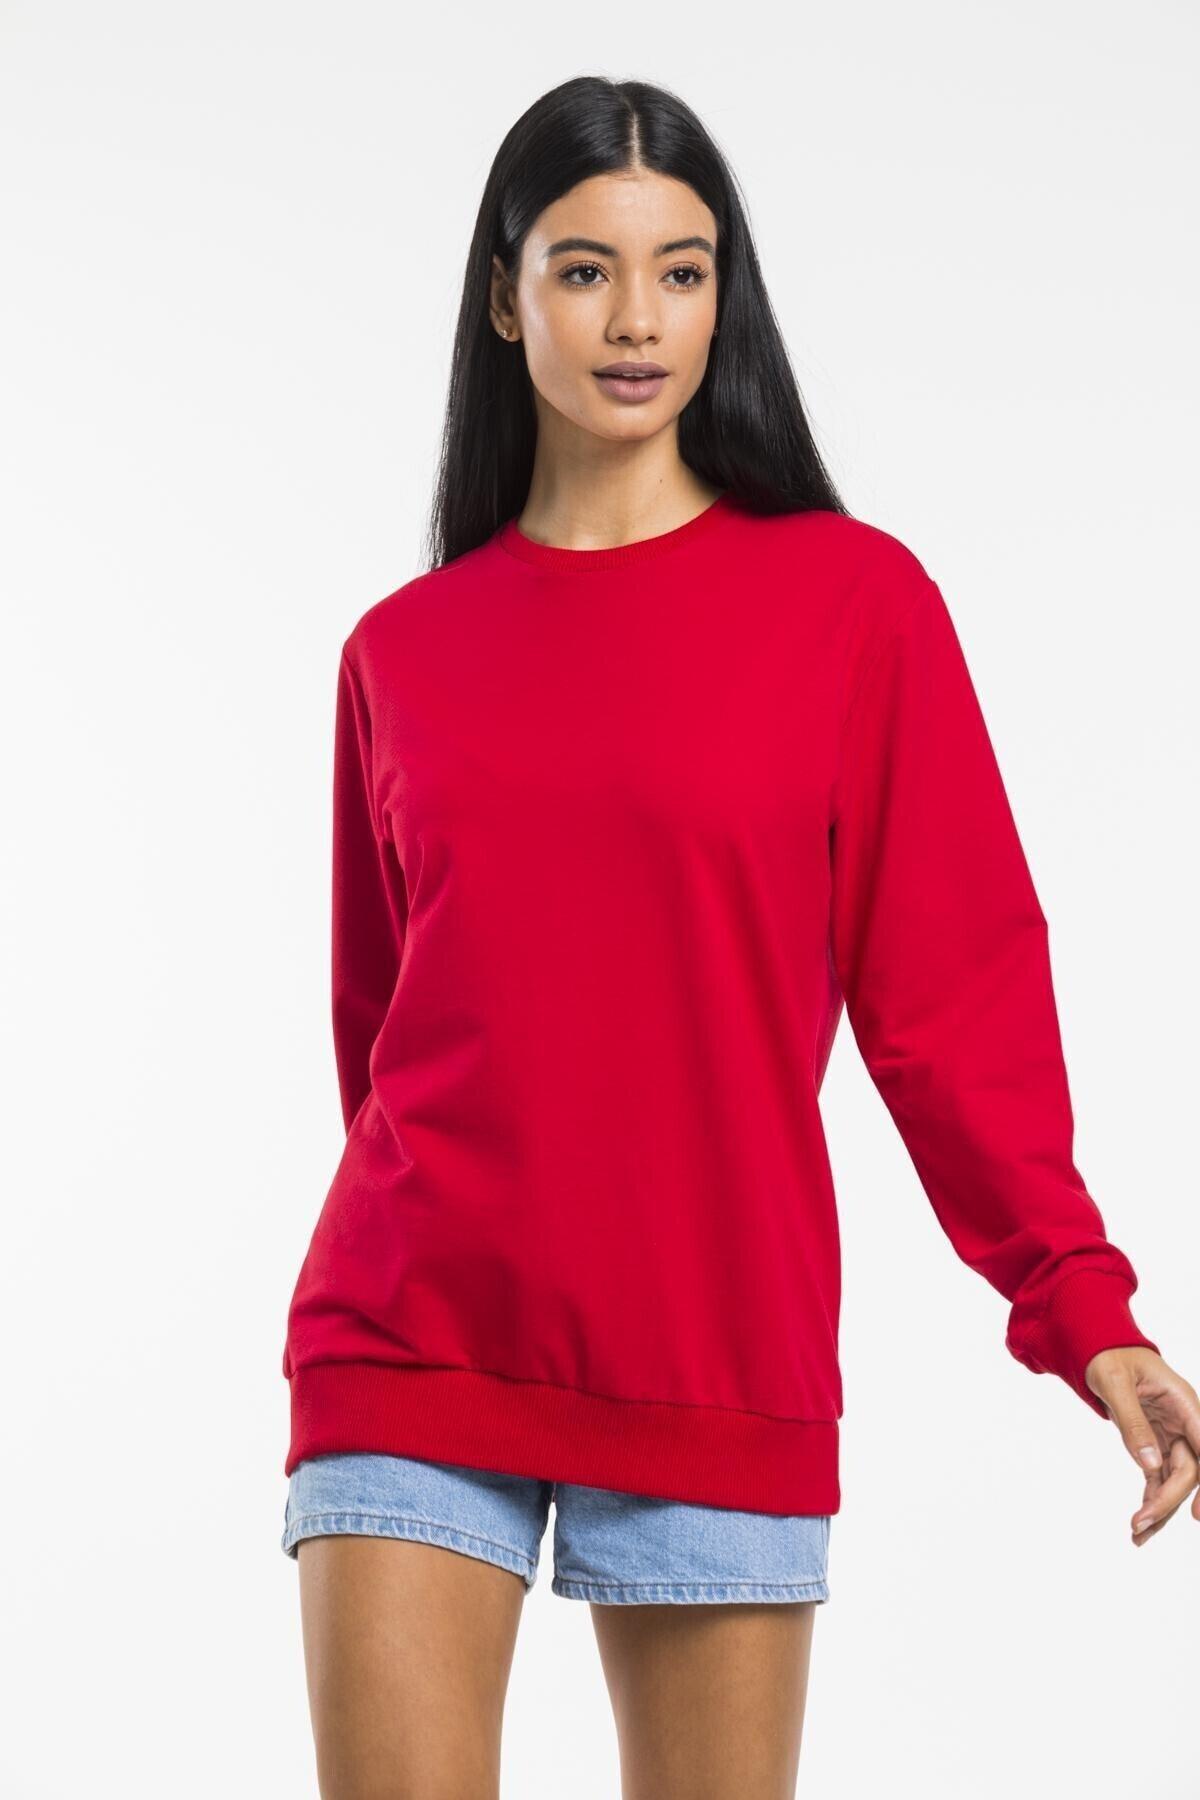 Superlife Kadın Bisiklet Yaka Sweatshirt 2